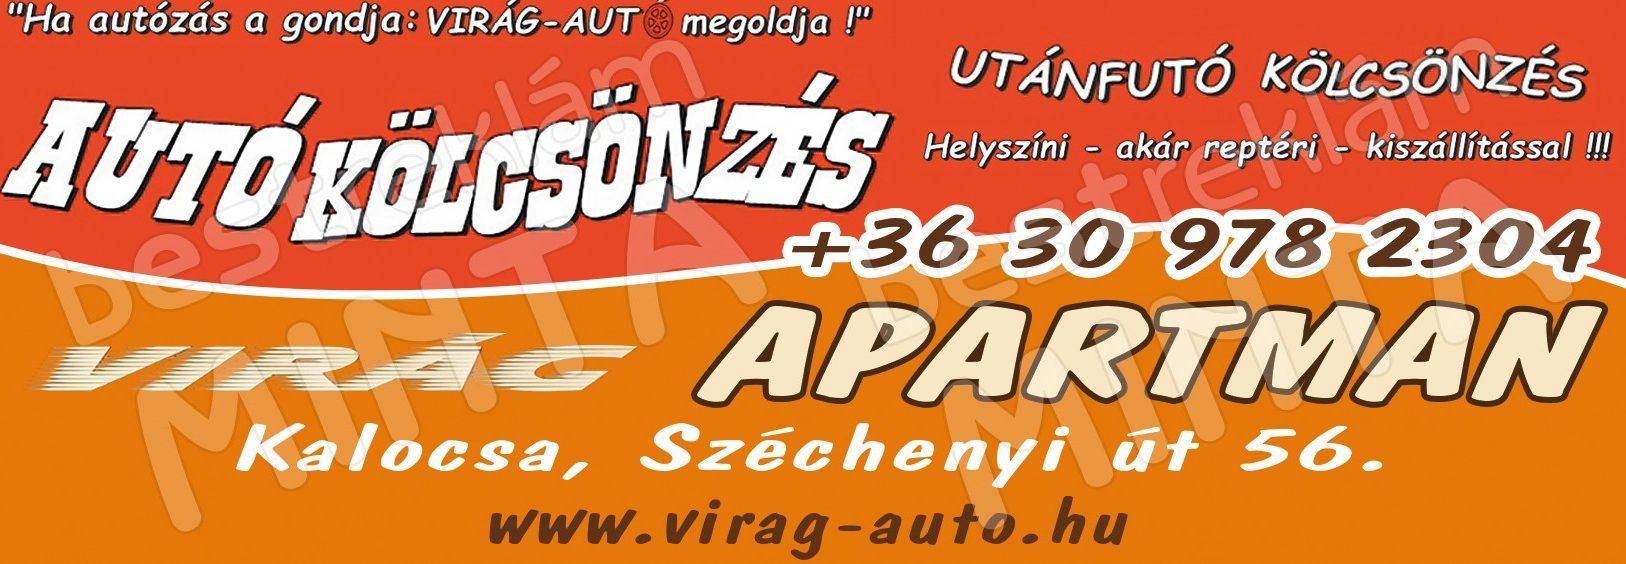 virag-auto